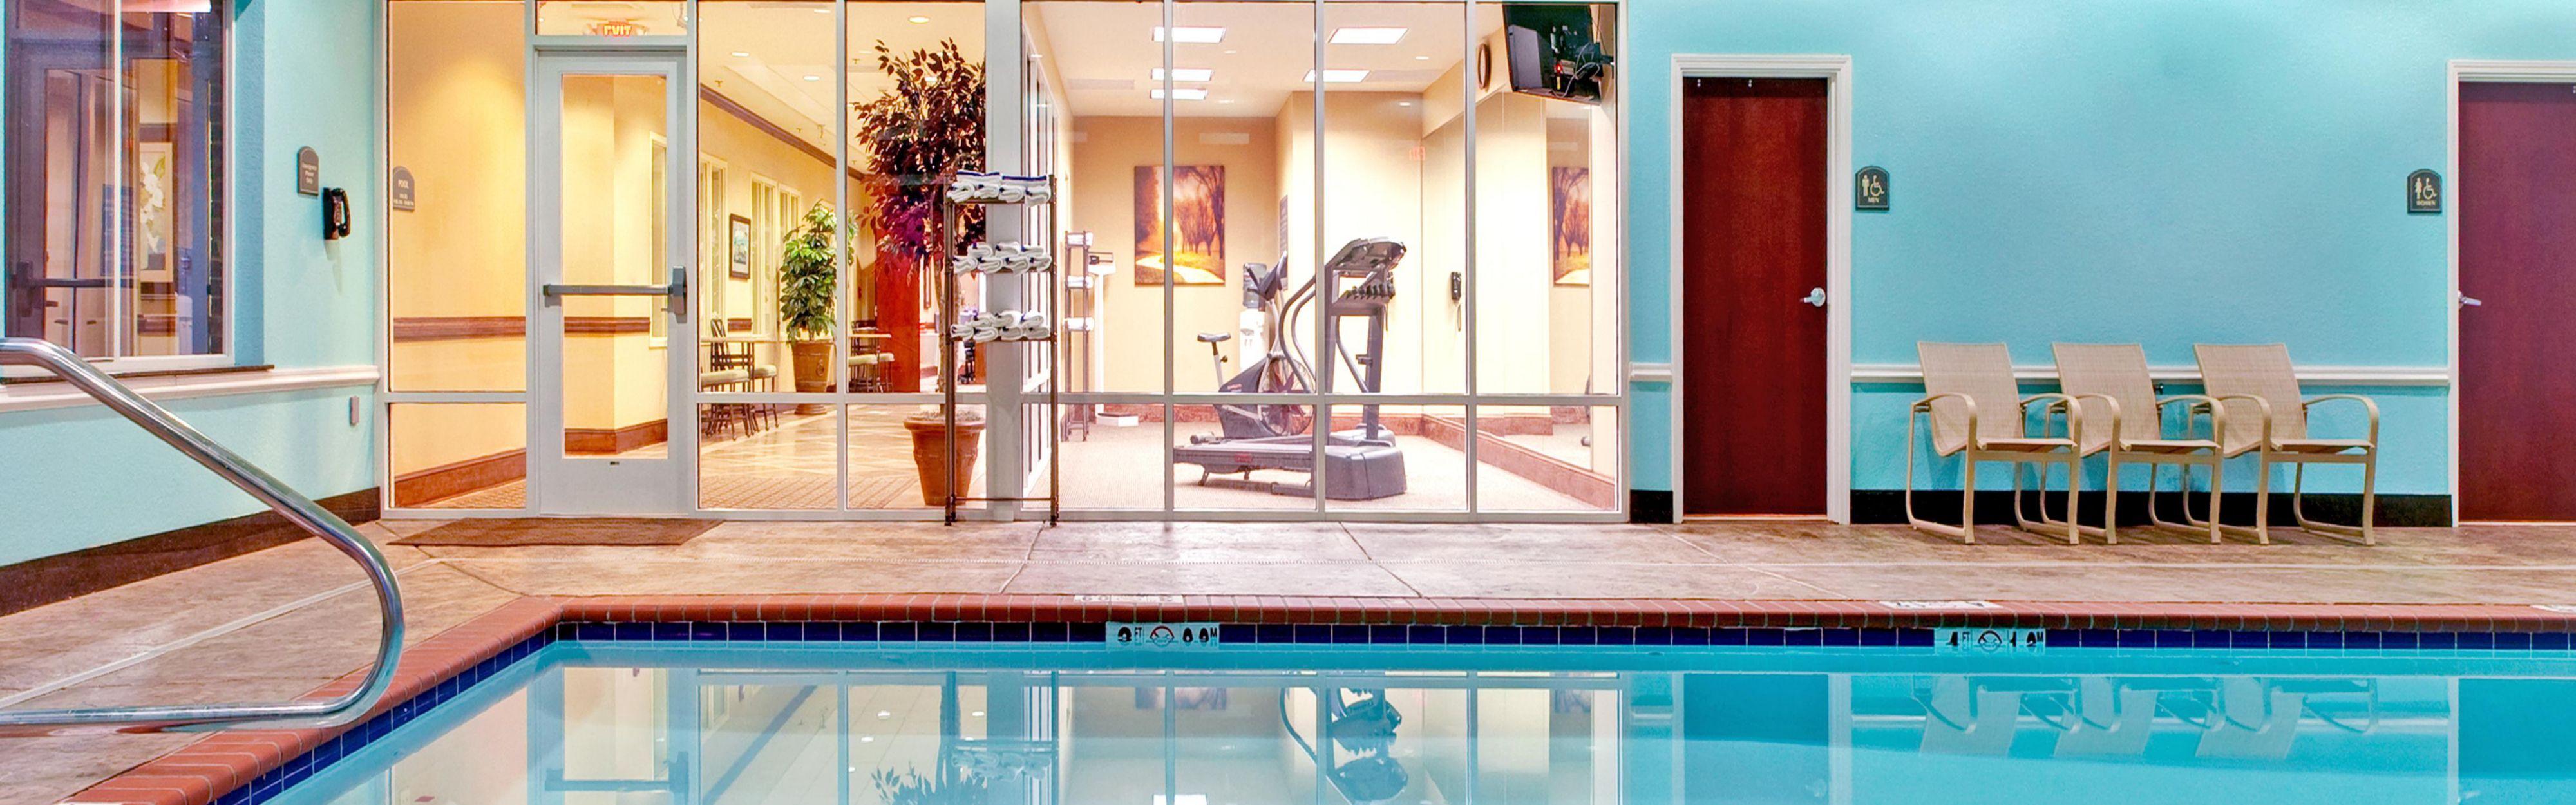 Holiday Inn Express Millington-Memphis Area image 2